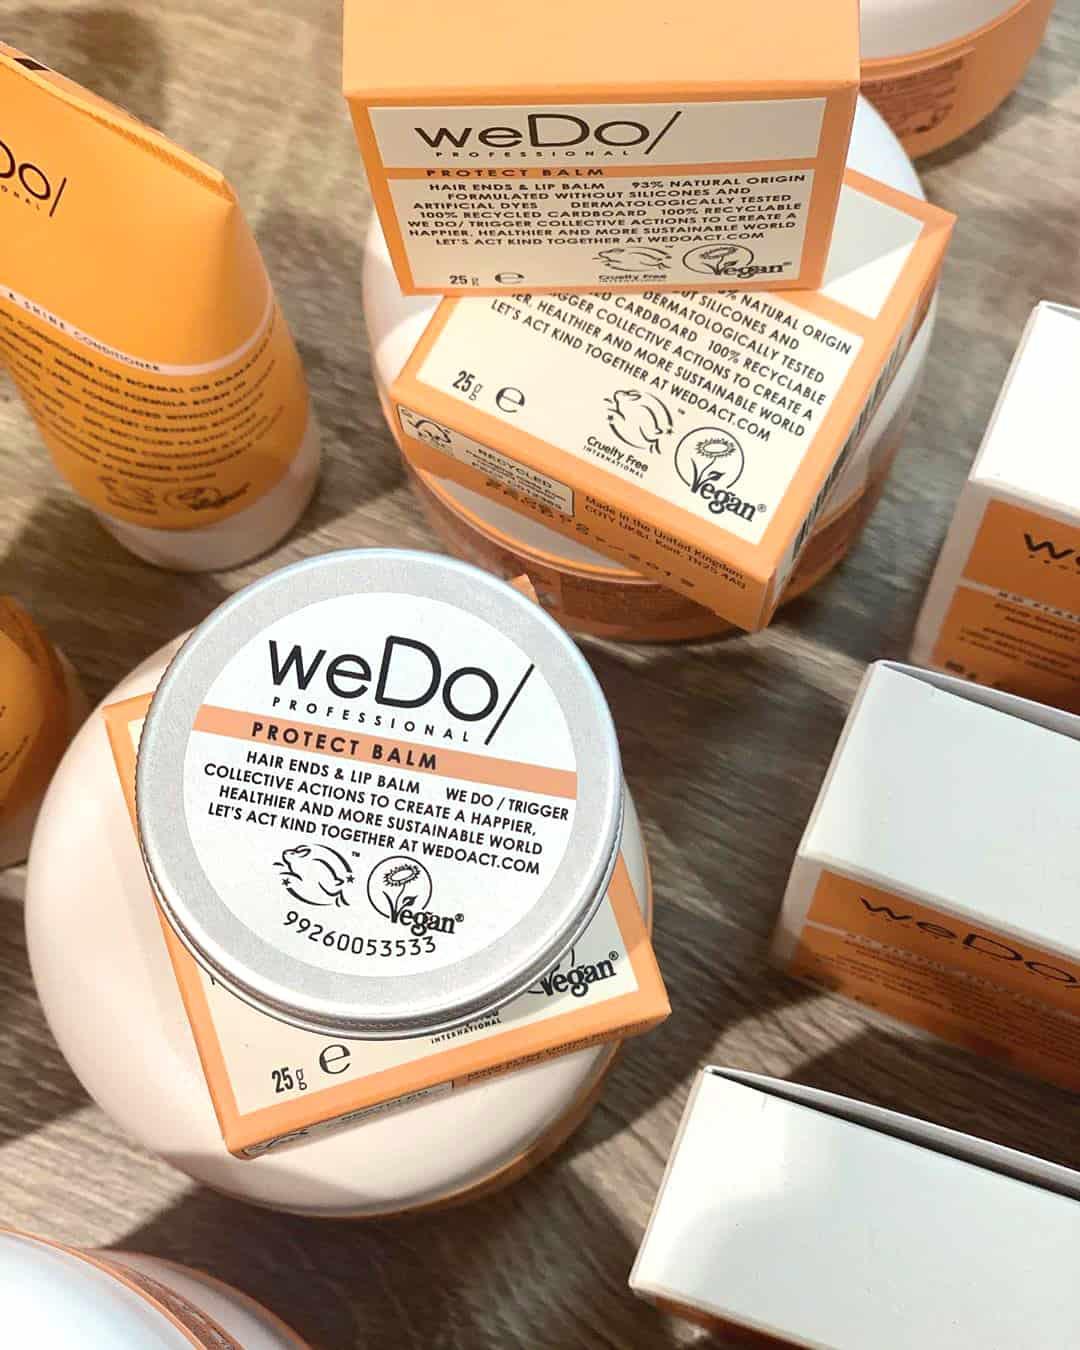 Wedo_Hair_Lip_Balm_3614229704952_8042_Group